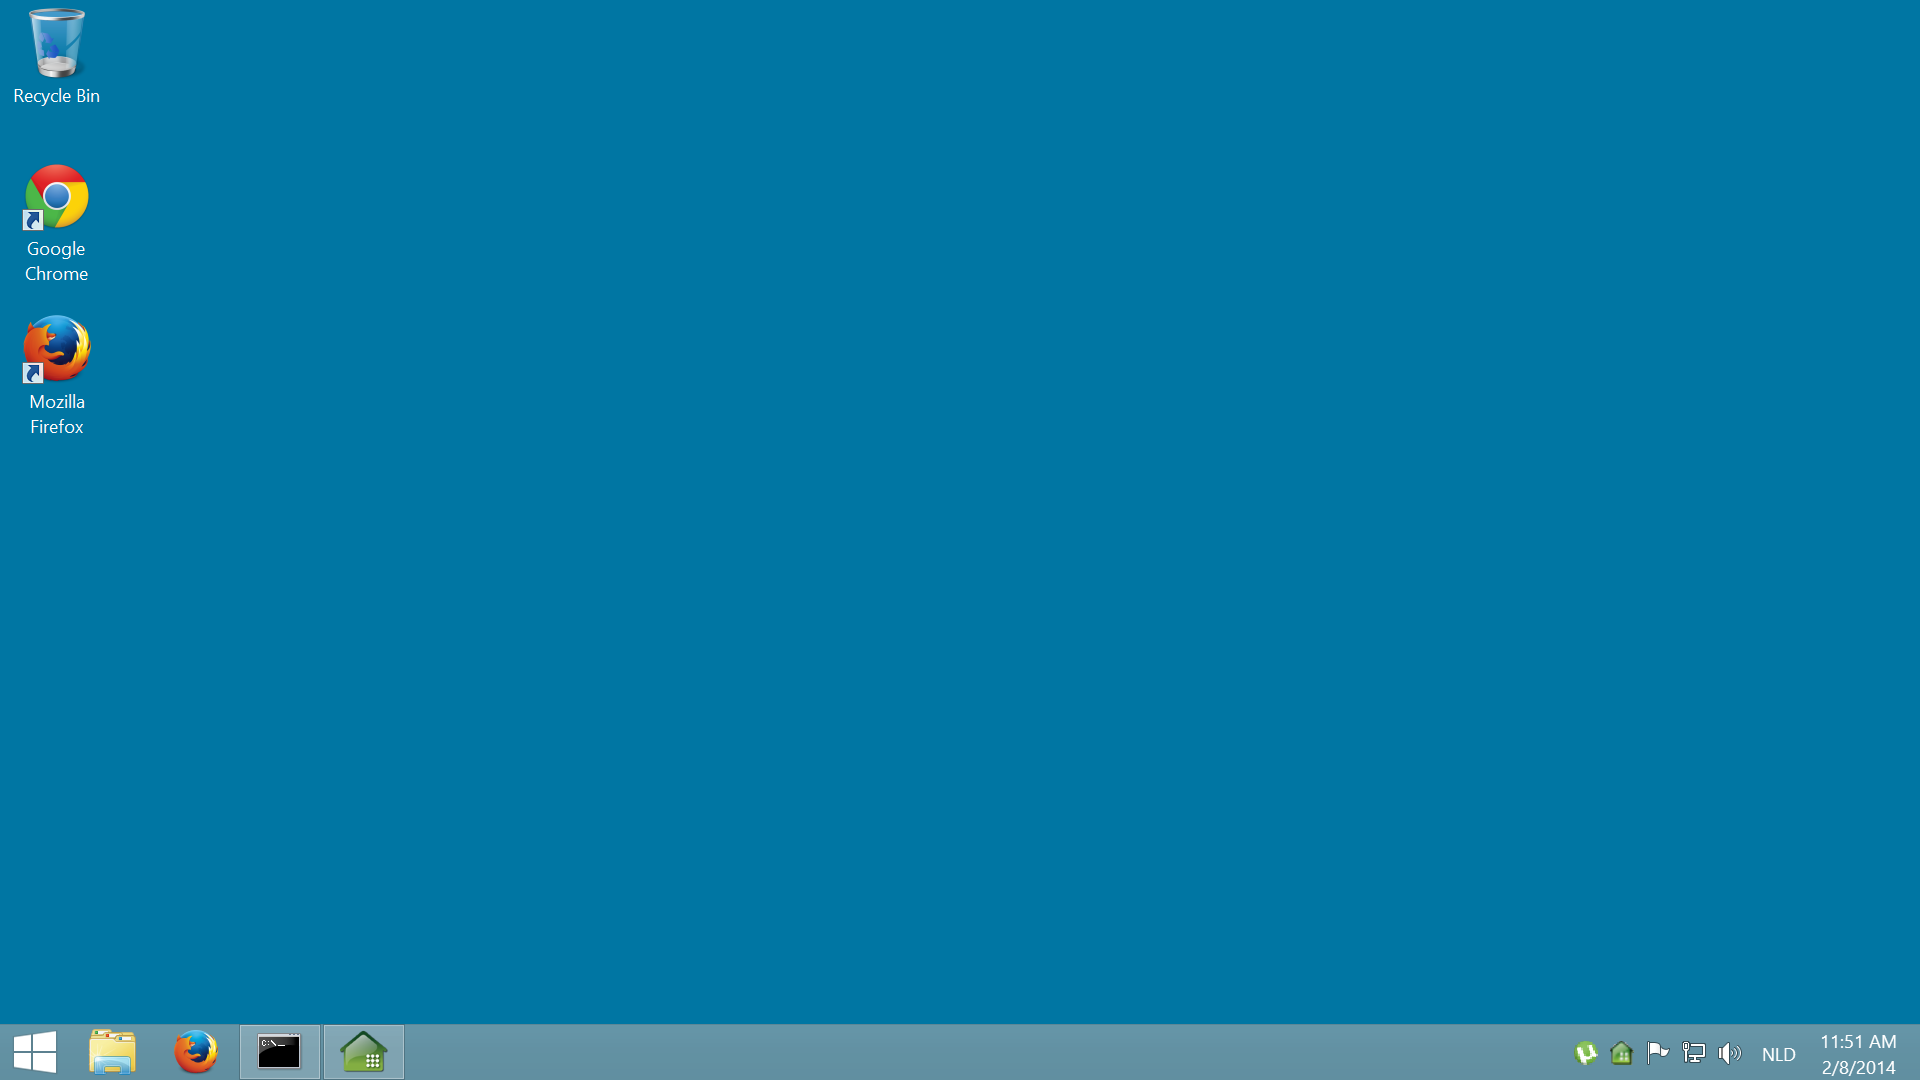 Windows 8.1 Desktop